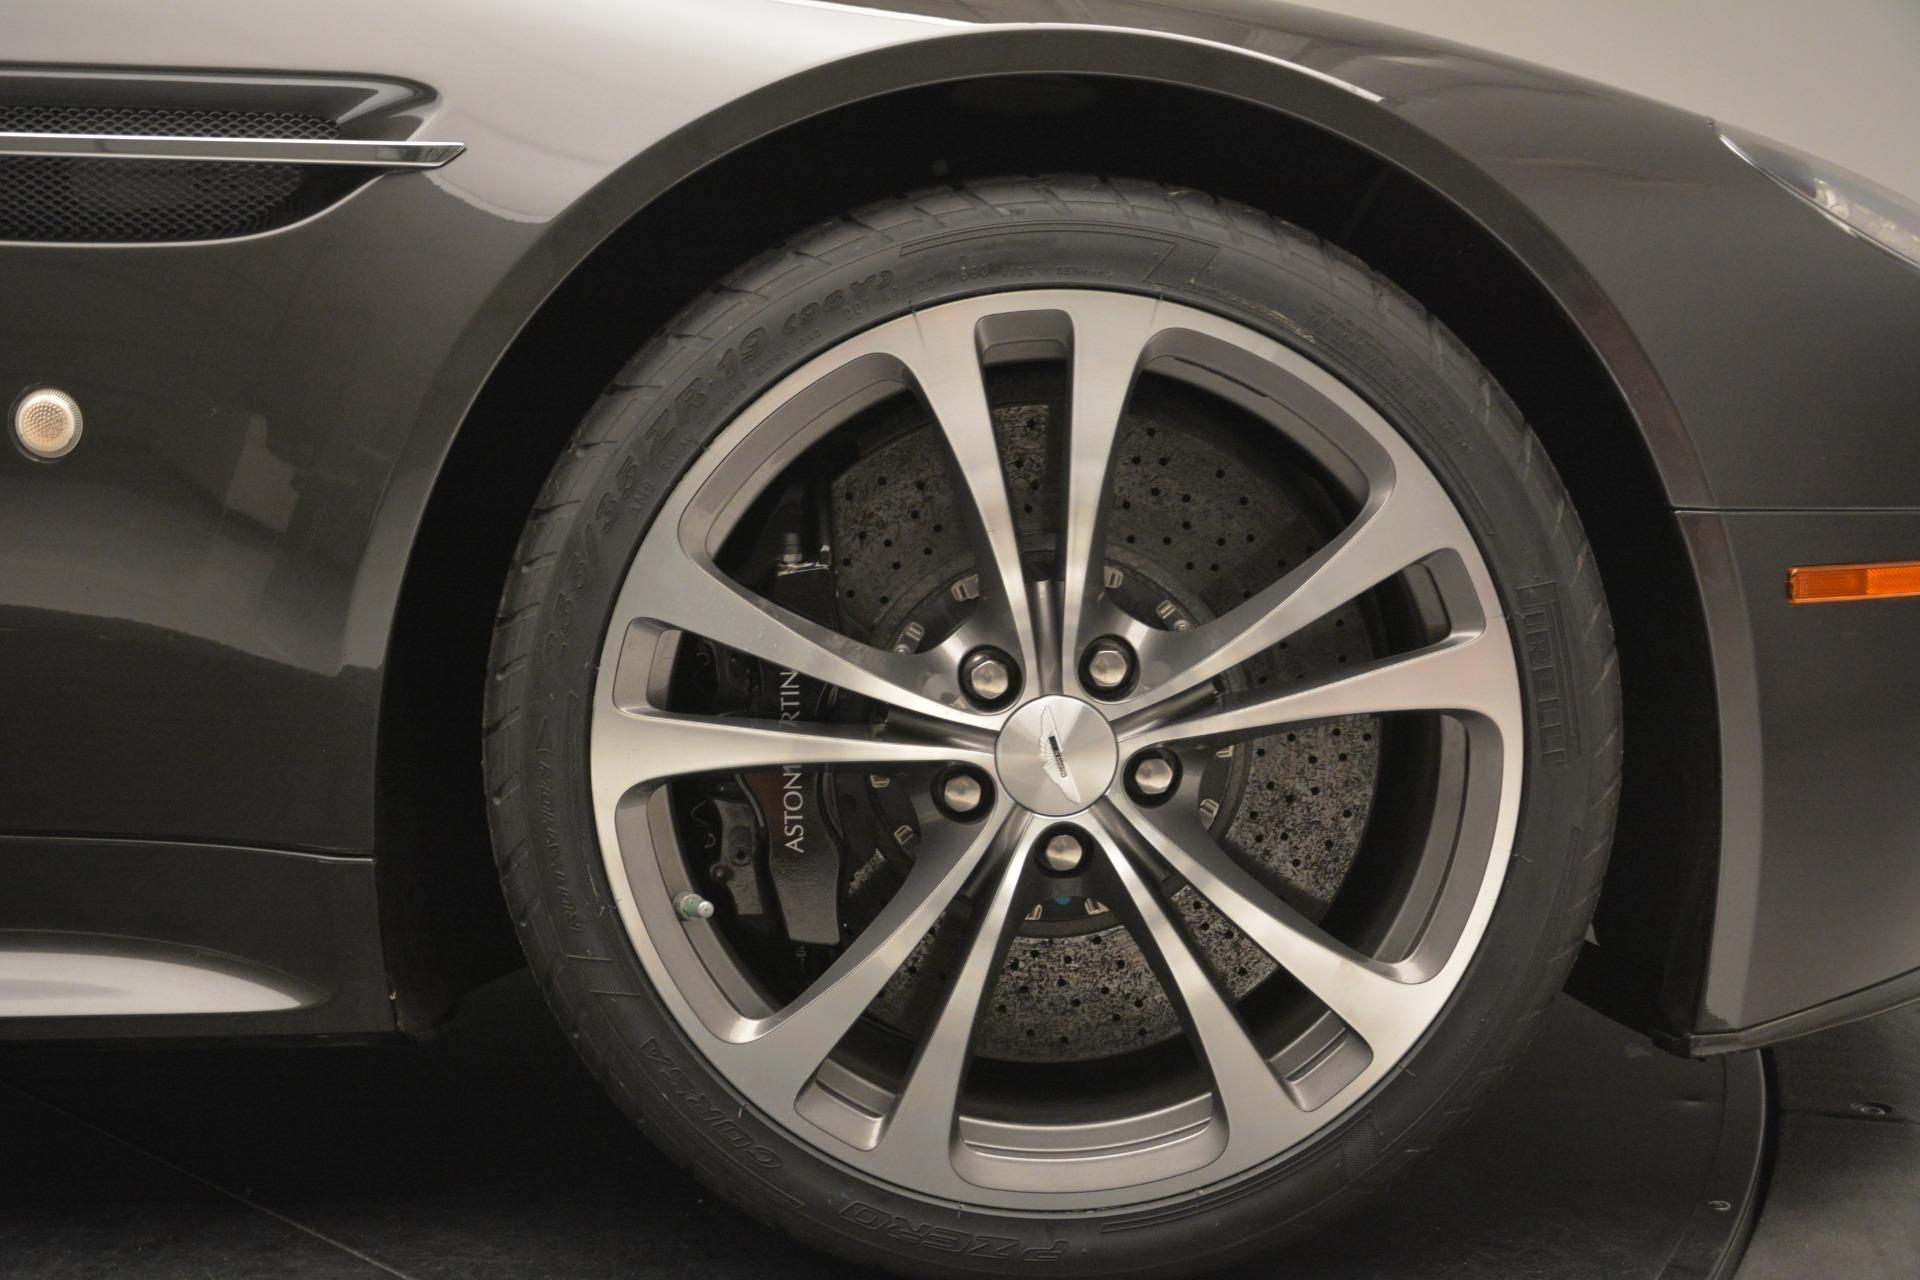 Used 2012 Aston Martin V12 Vantage Coupe For Sale In Greenwich, CT. Alfa Romeo of Greenwich, 7425 2544_p19